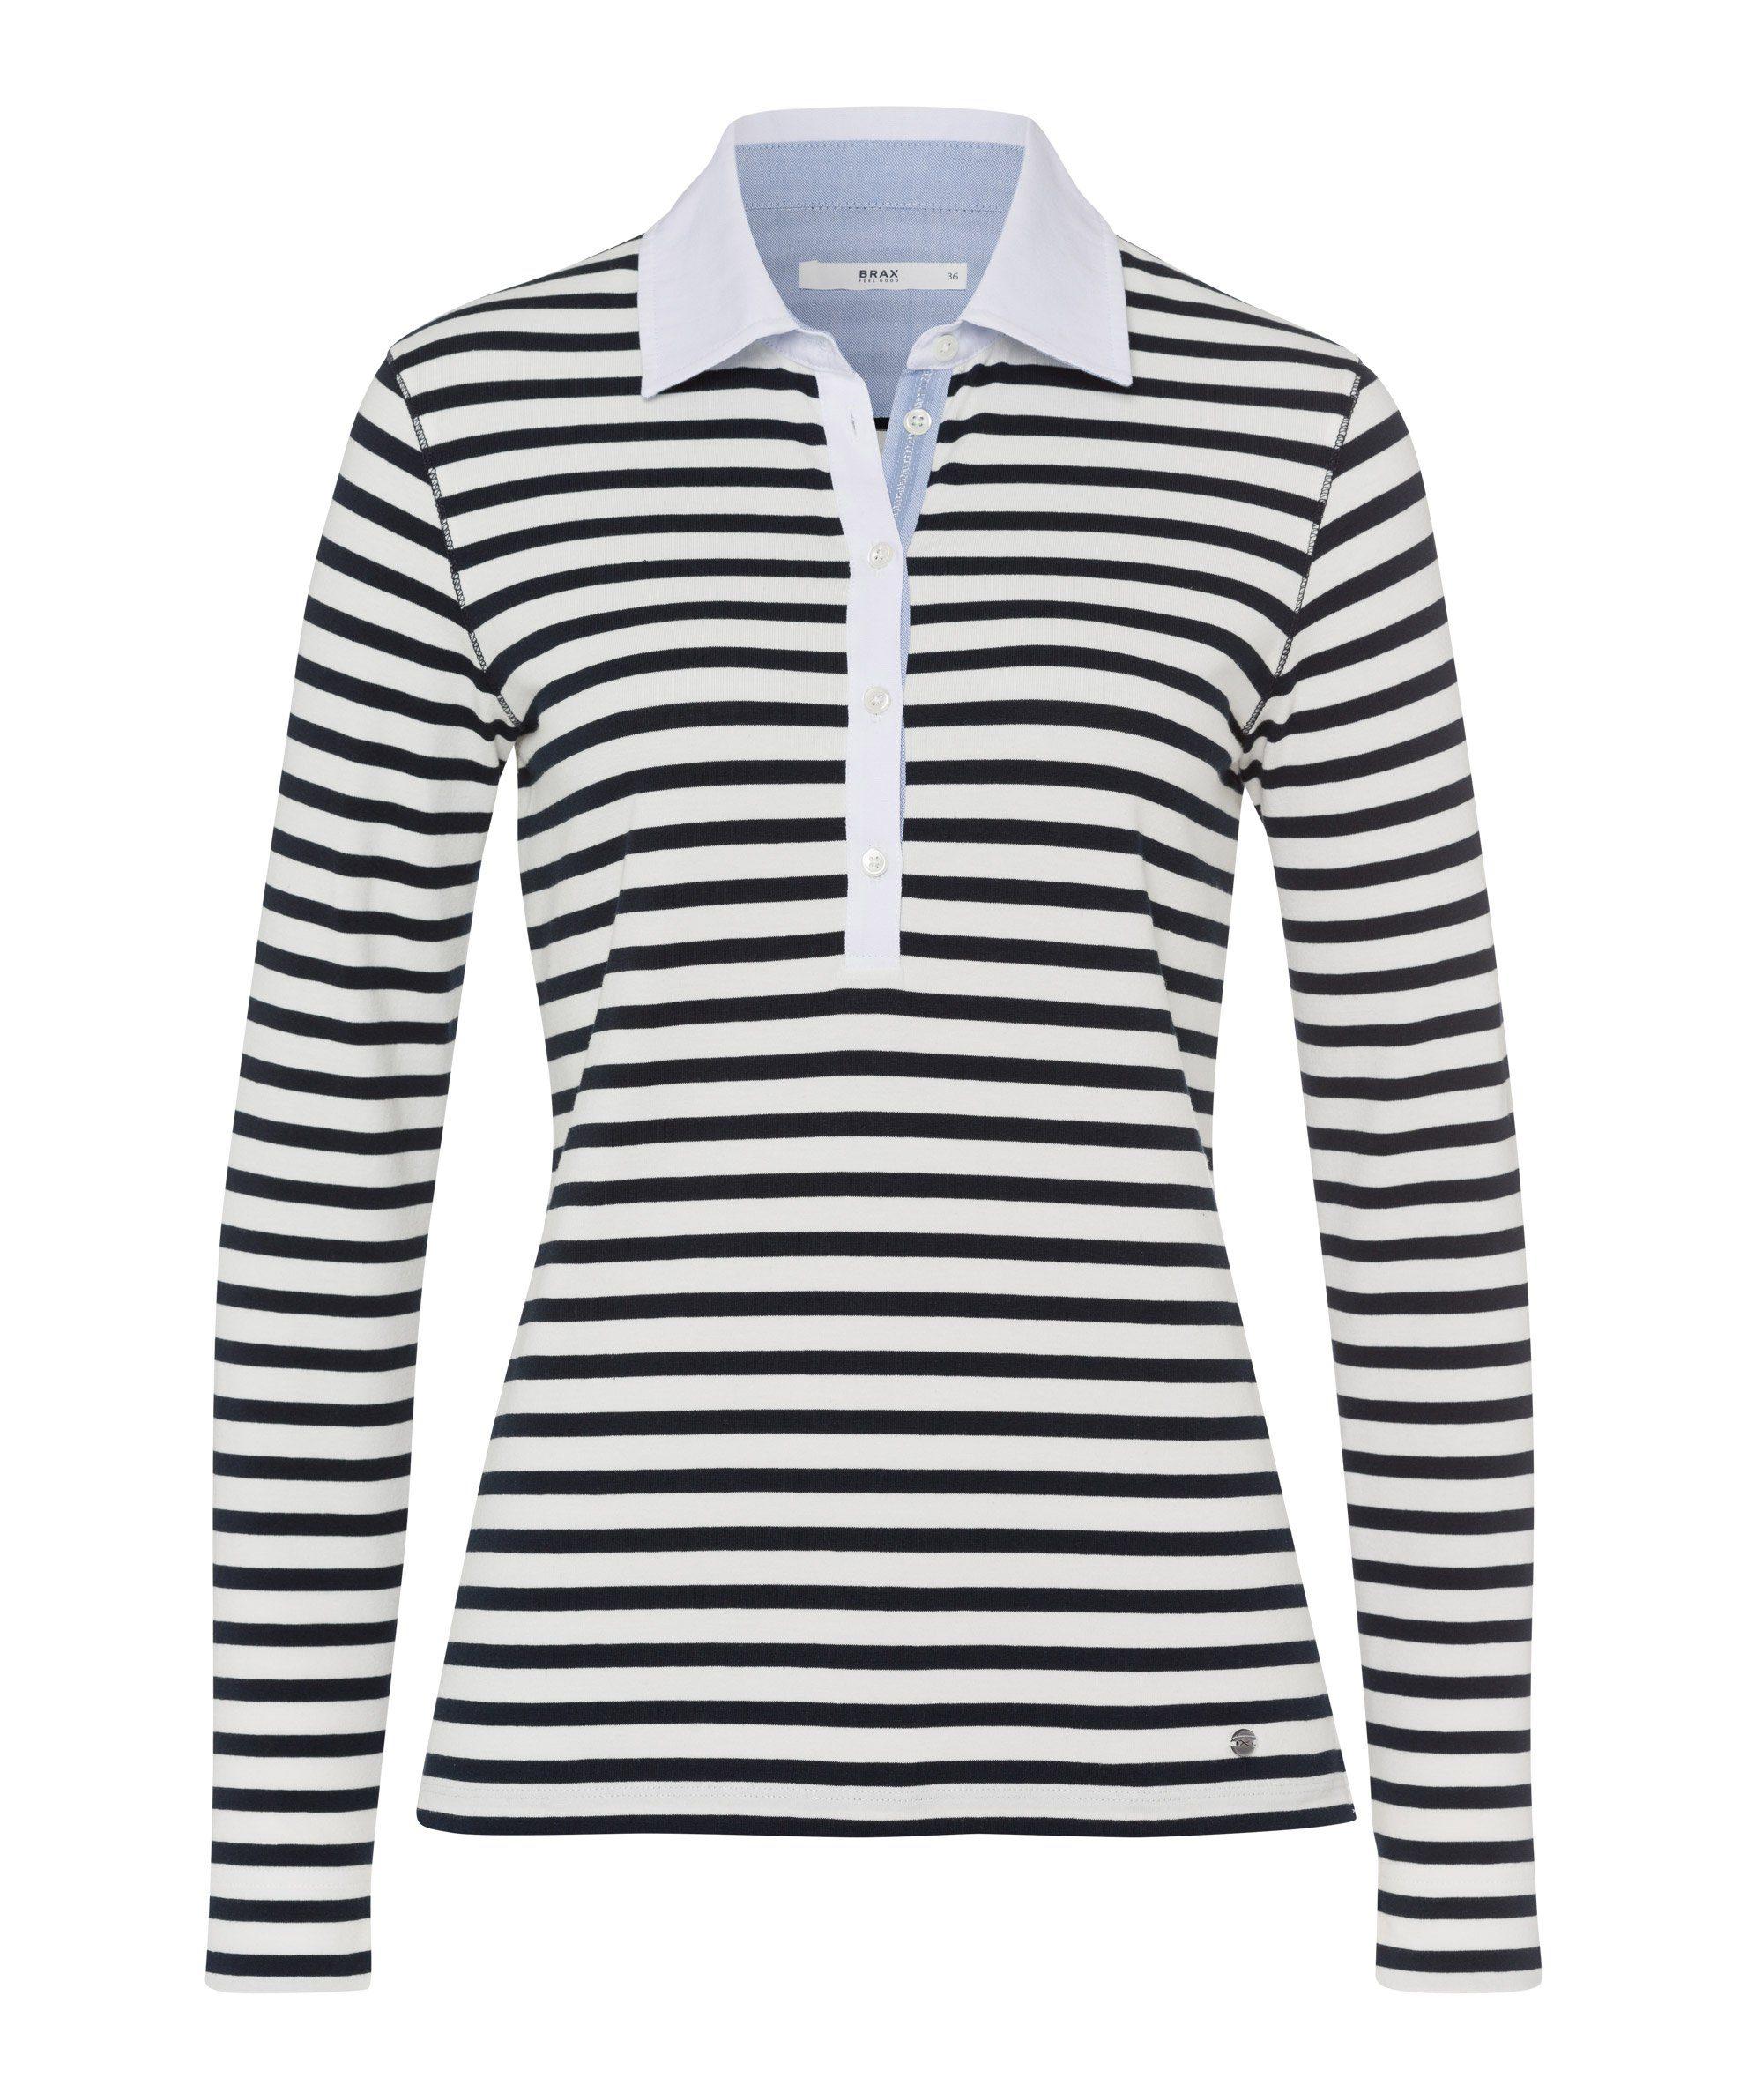 Cecille« Brax Online »style Kaufen Poloshirt yvOwP8mNn0